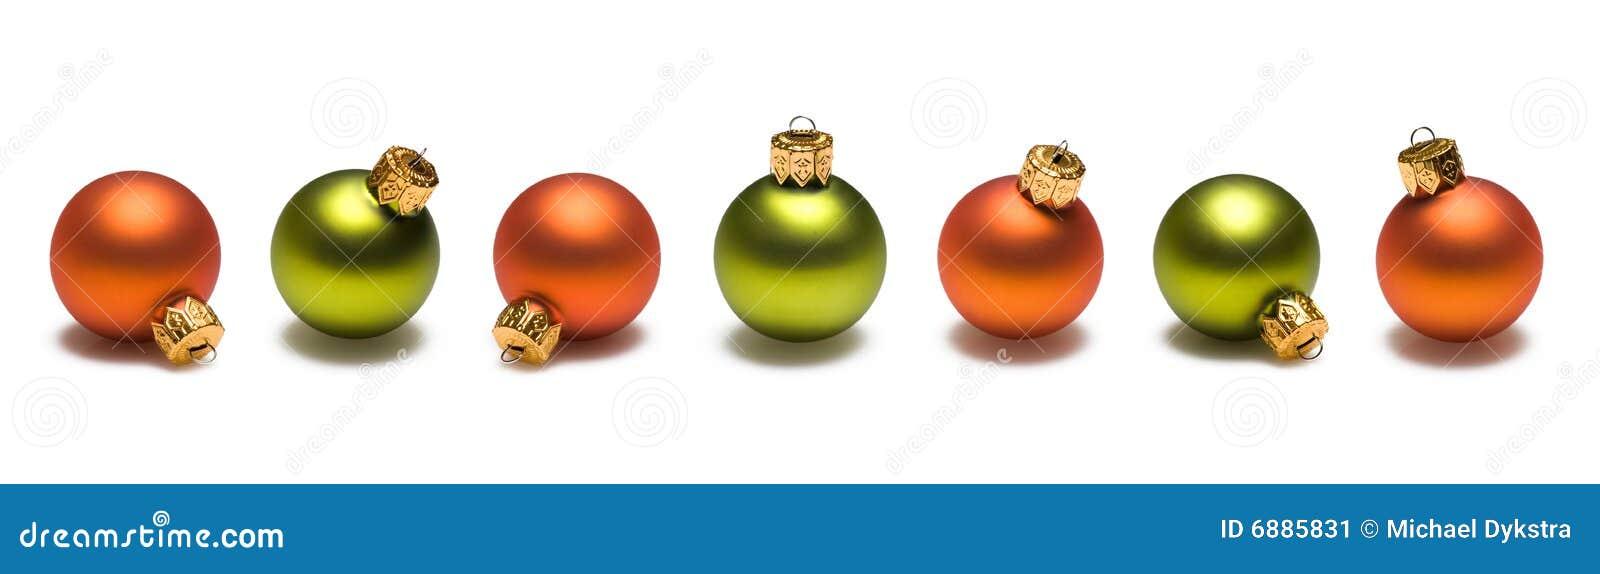 Green And Orange Christmas Balls Border Stock Image ...